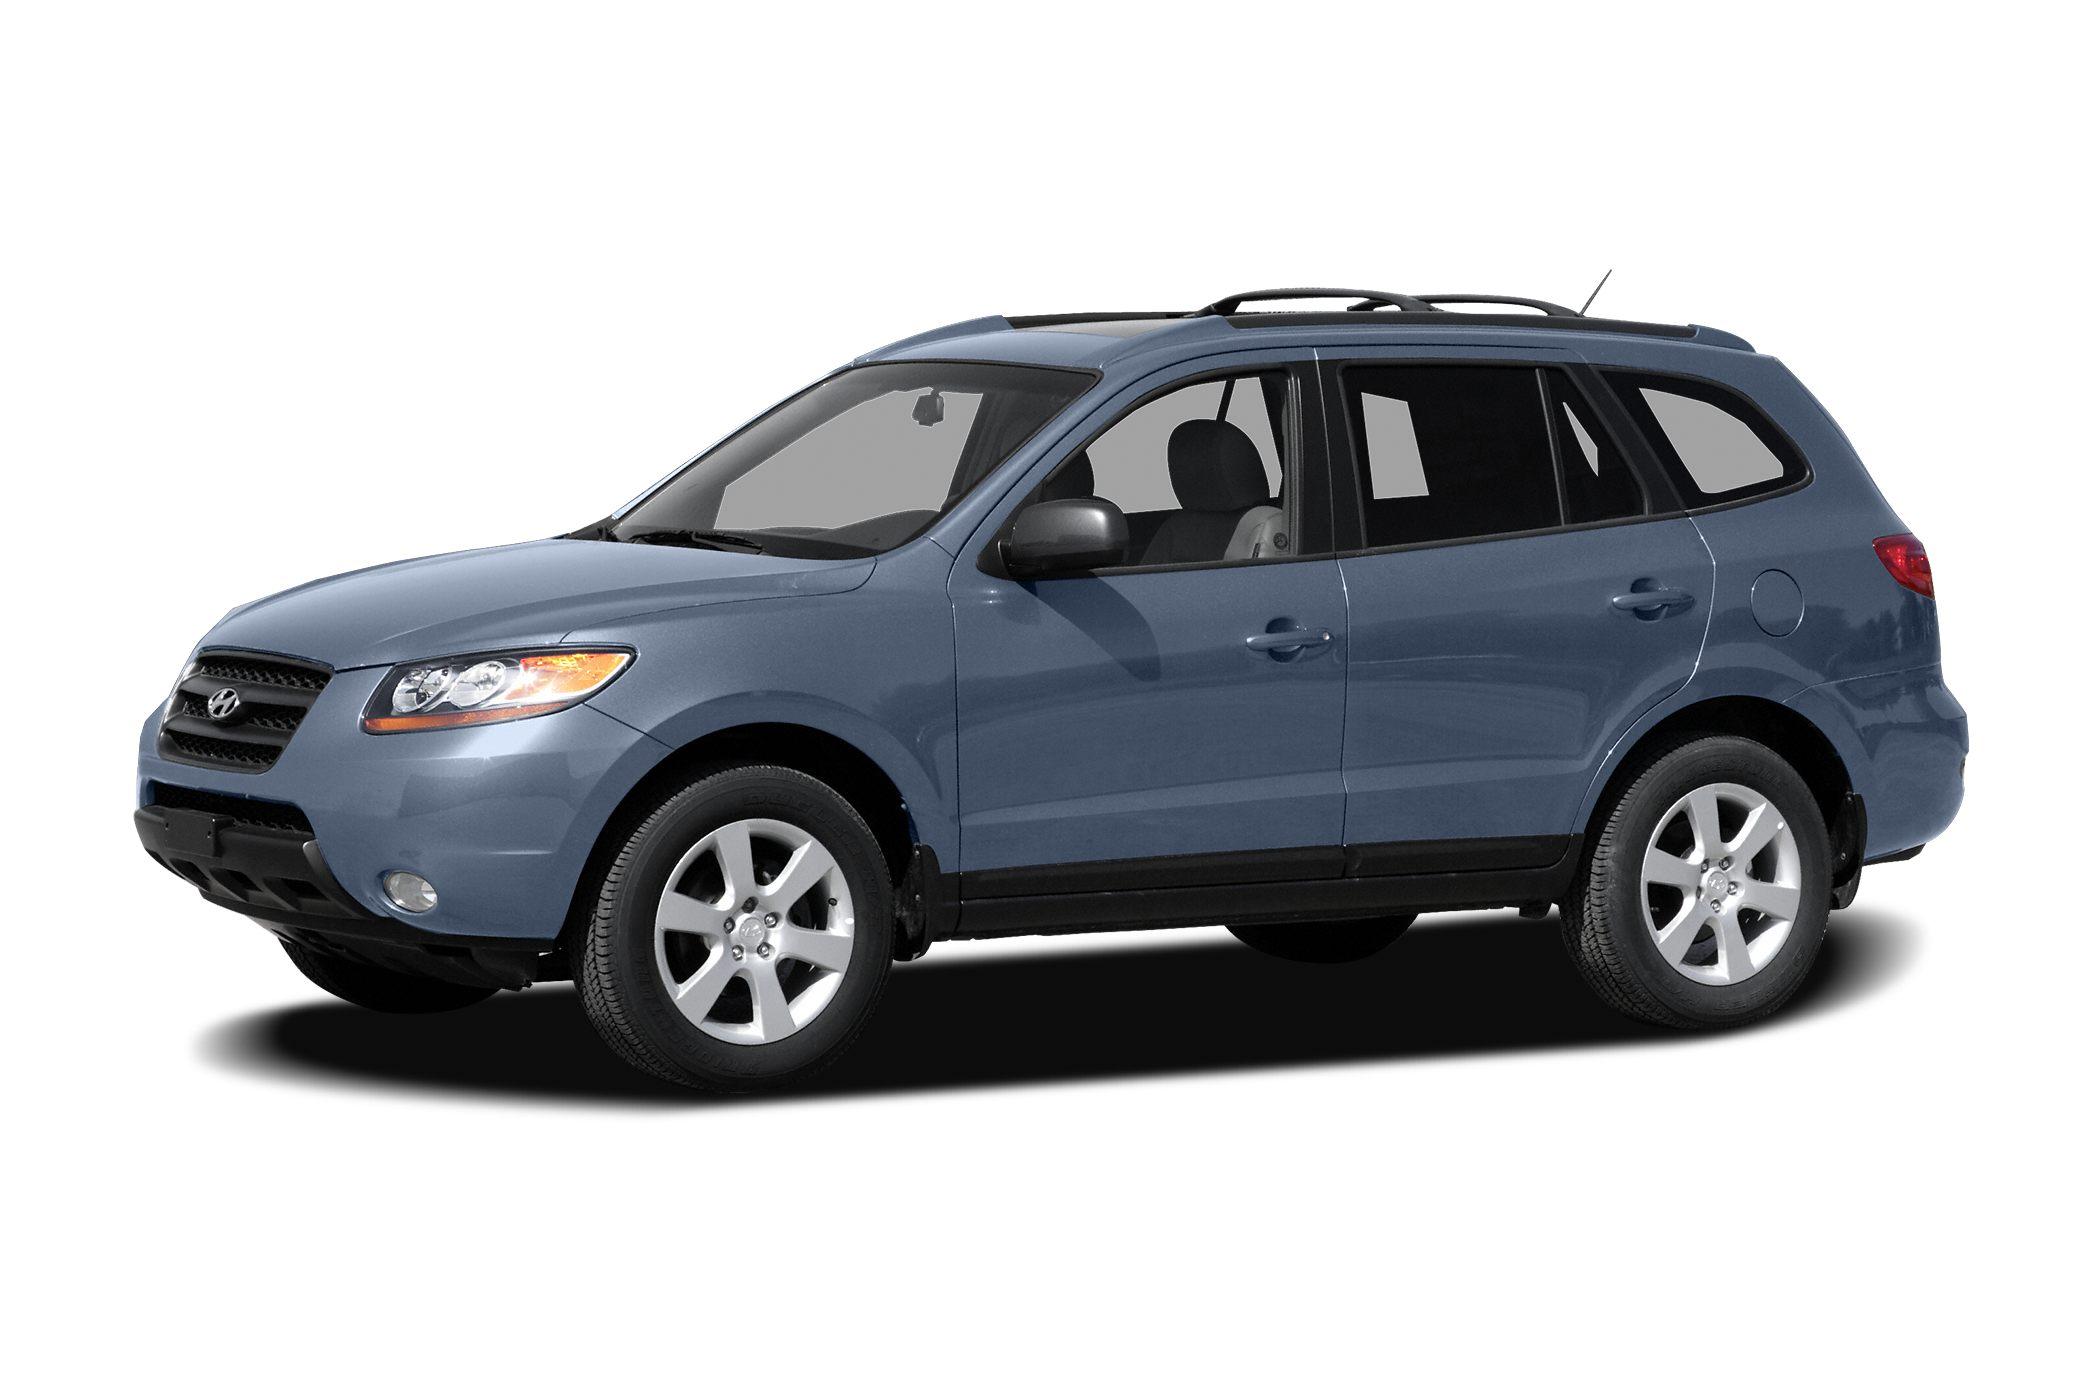 2009 Hyundai Santa Fe GLS SUV for sale in Orangeburg for $12,995 with 92,209 miles.